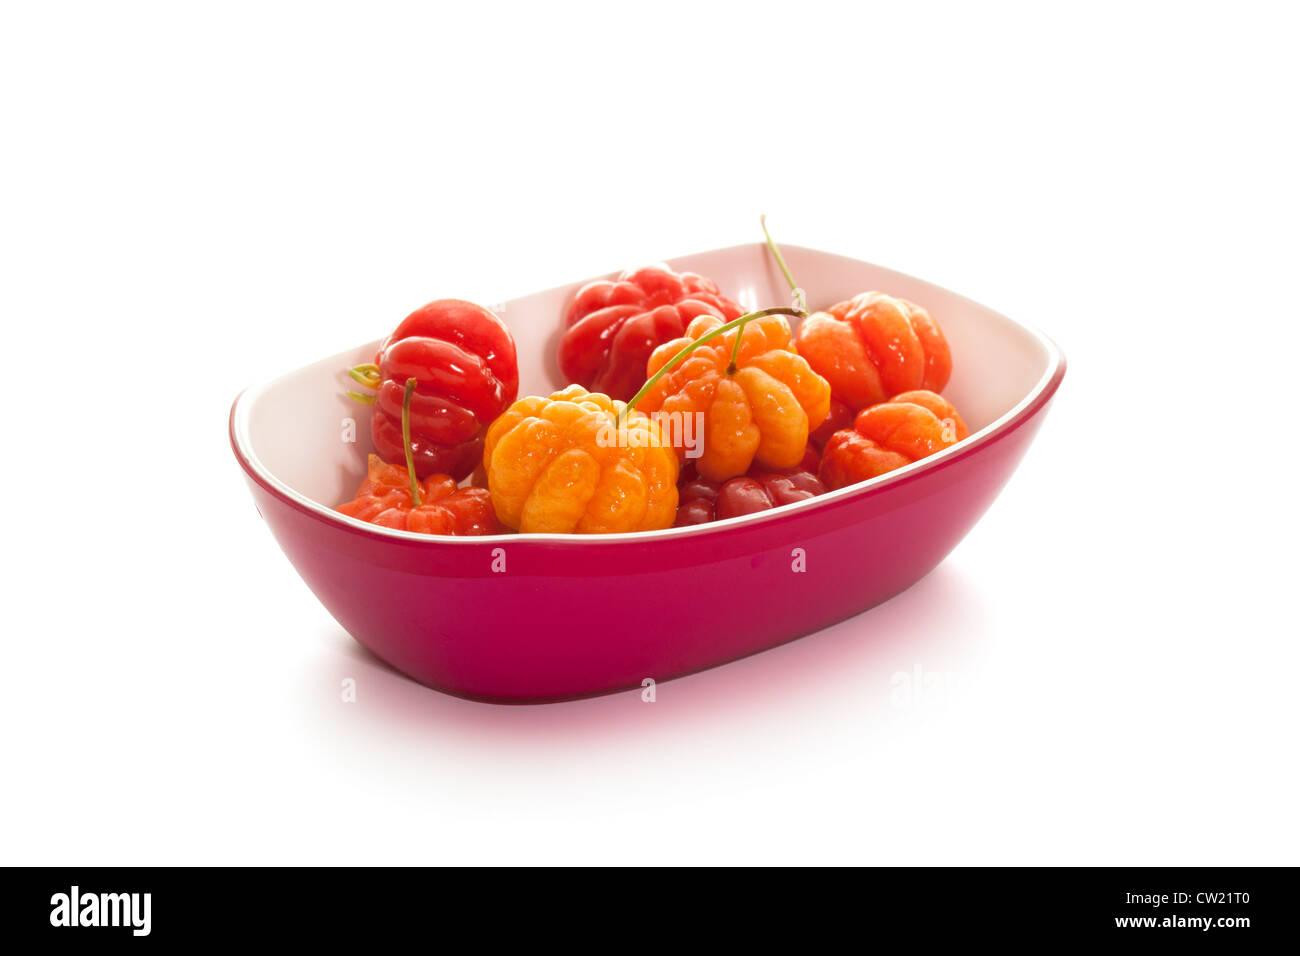 star gooseberry in magenta bowl on white background - Stock Image